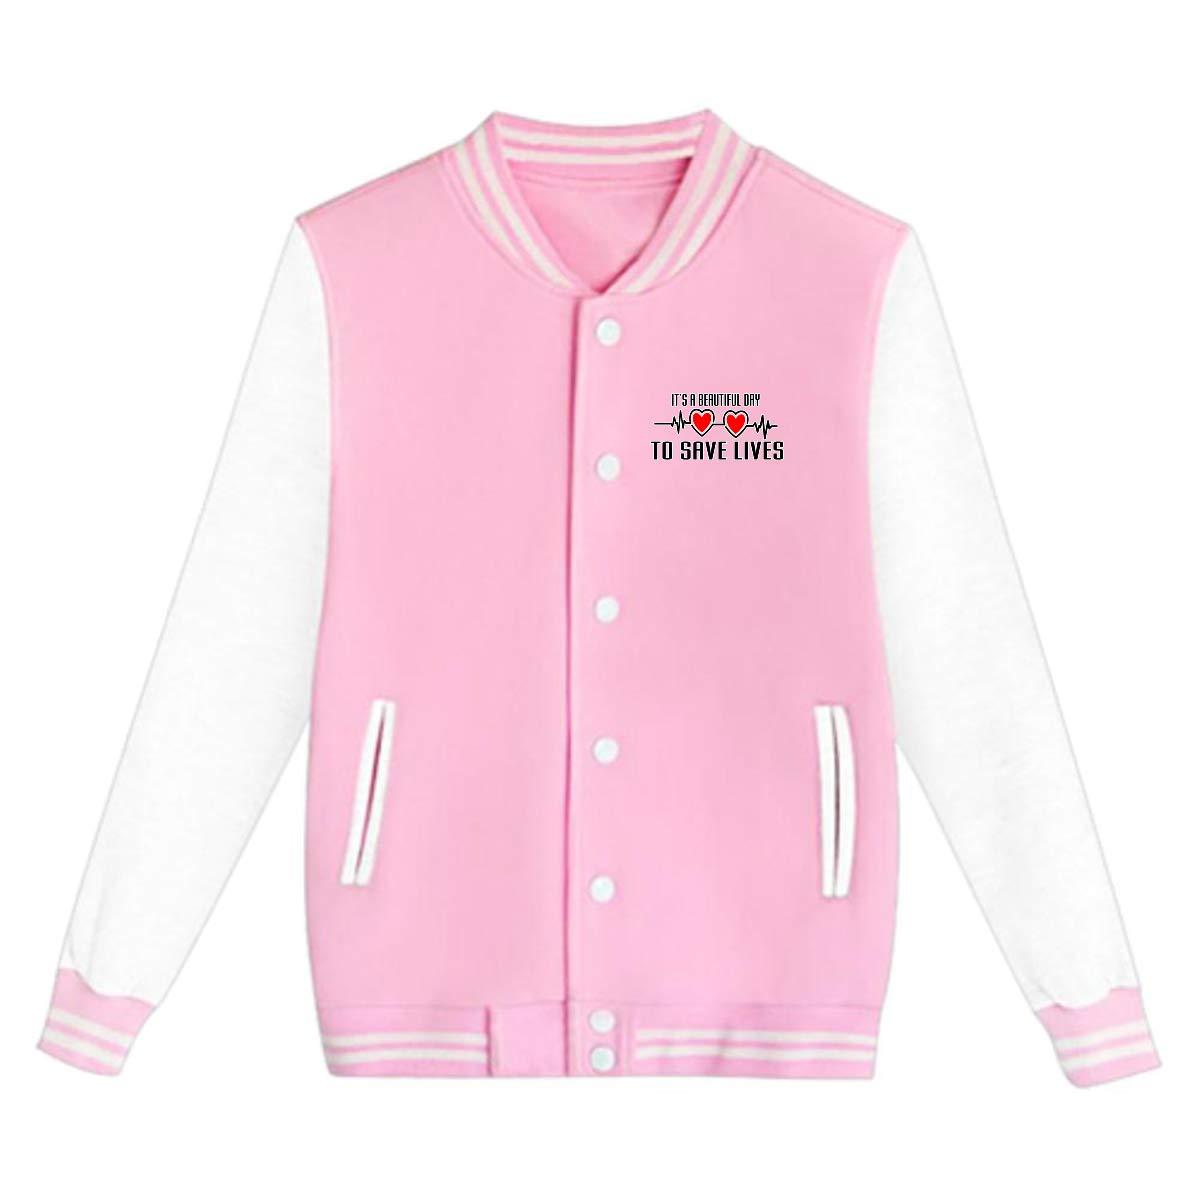 Tina TN Its A Beautiful Day to Save Lives Teens Boys Girl Varsity Baseball Jacket Long Sleeve Sport Baseball Uniform Jacket Coat Sweater Black